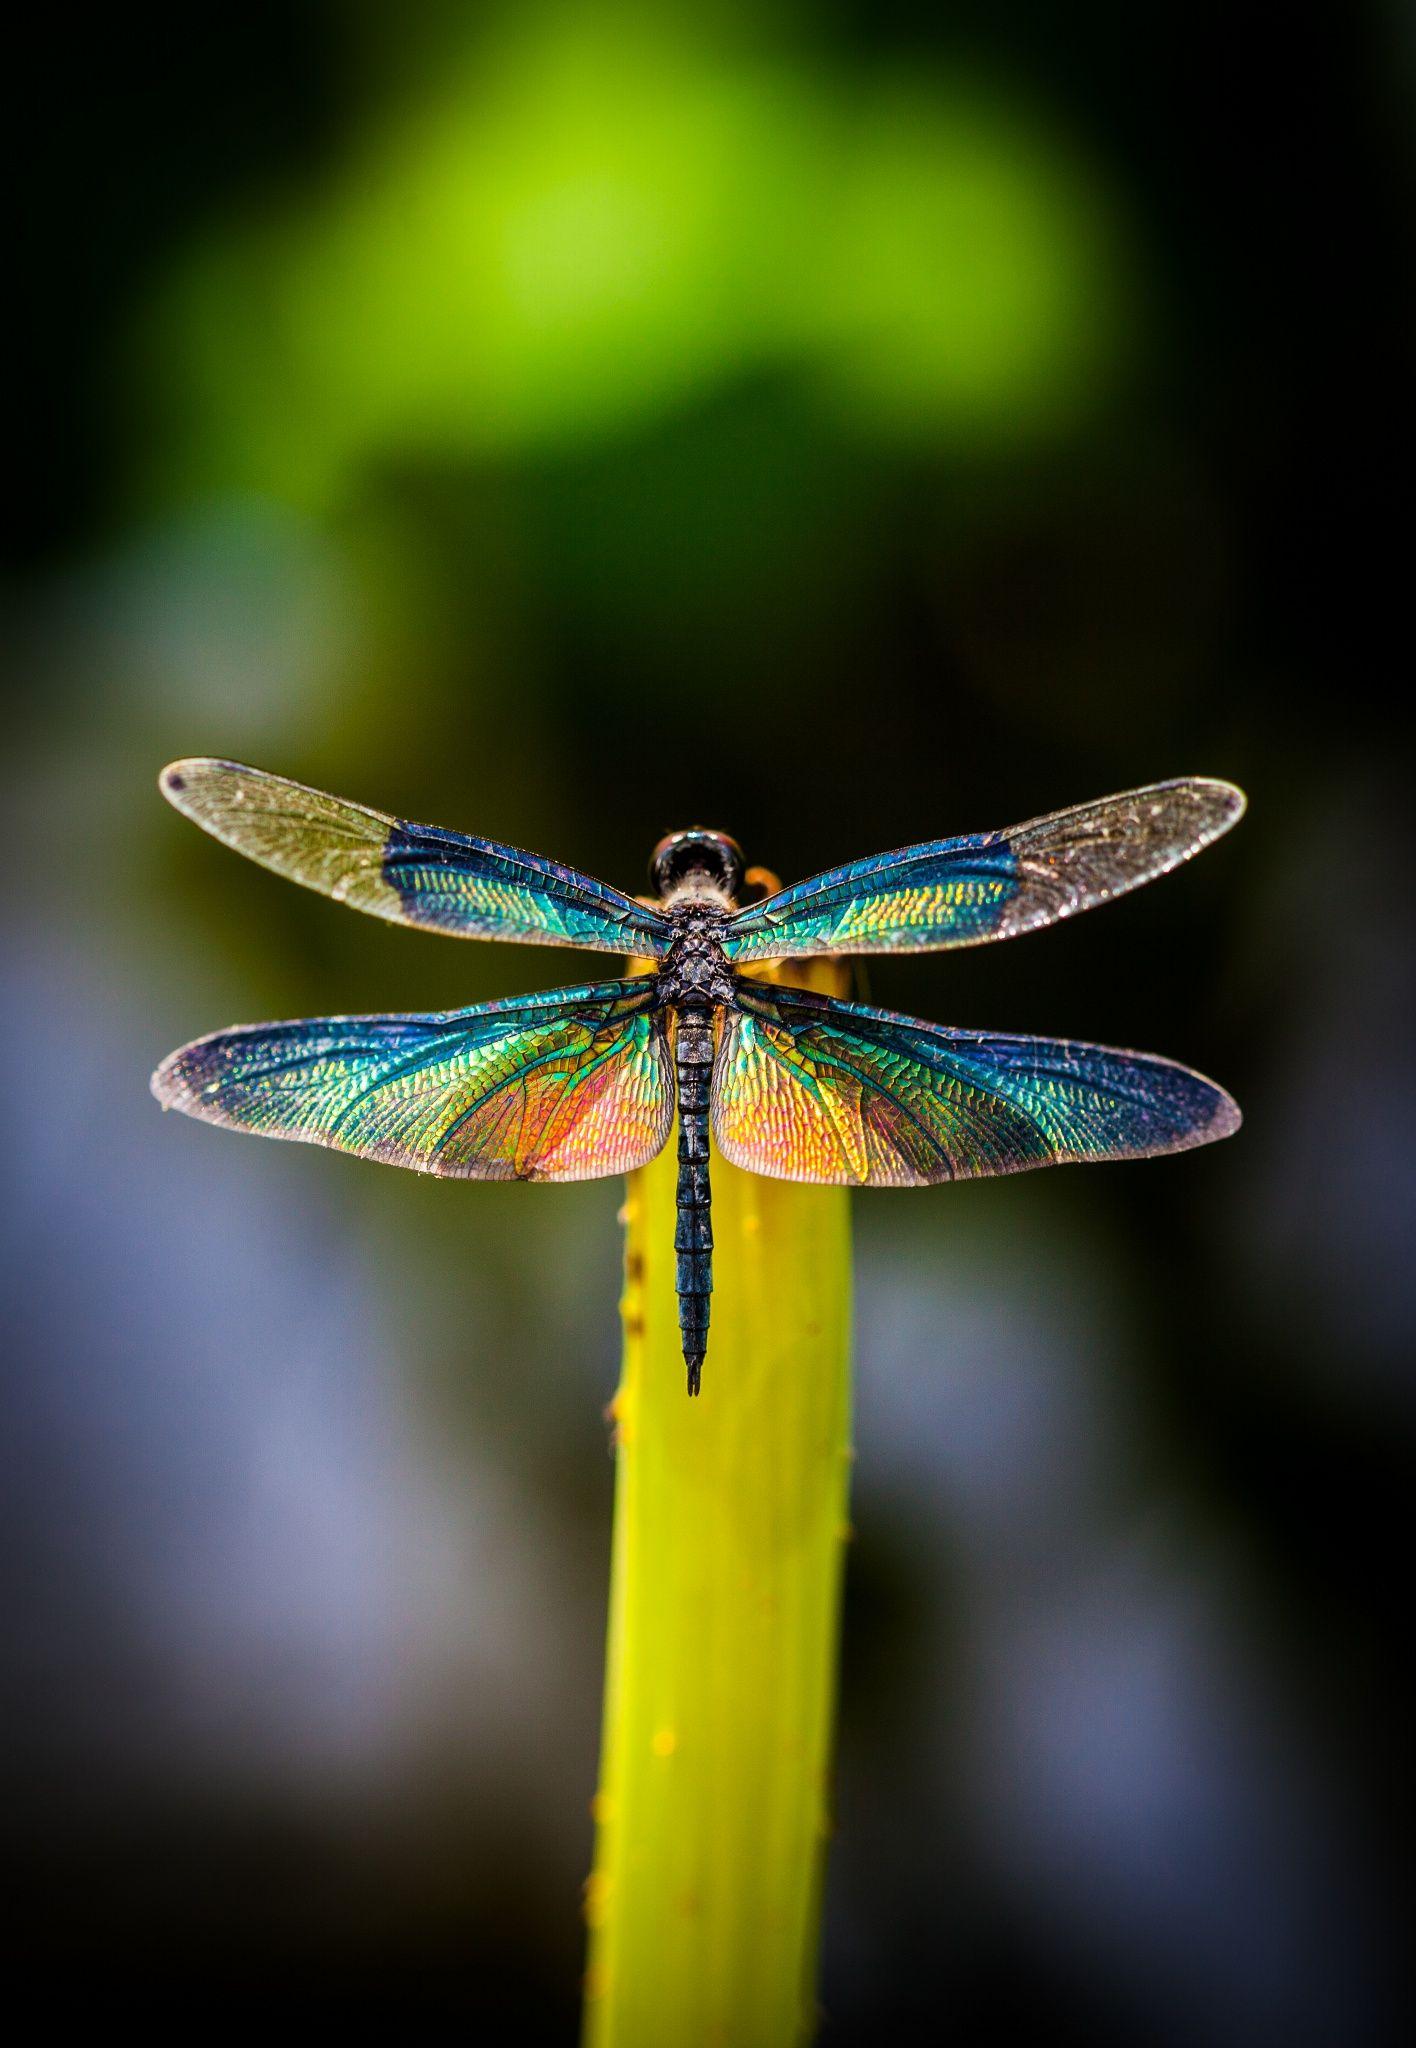 Chú chuồn chuồn có đôi cánh sặc sỡ